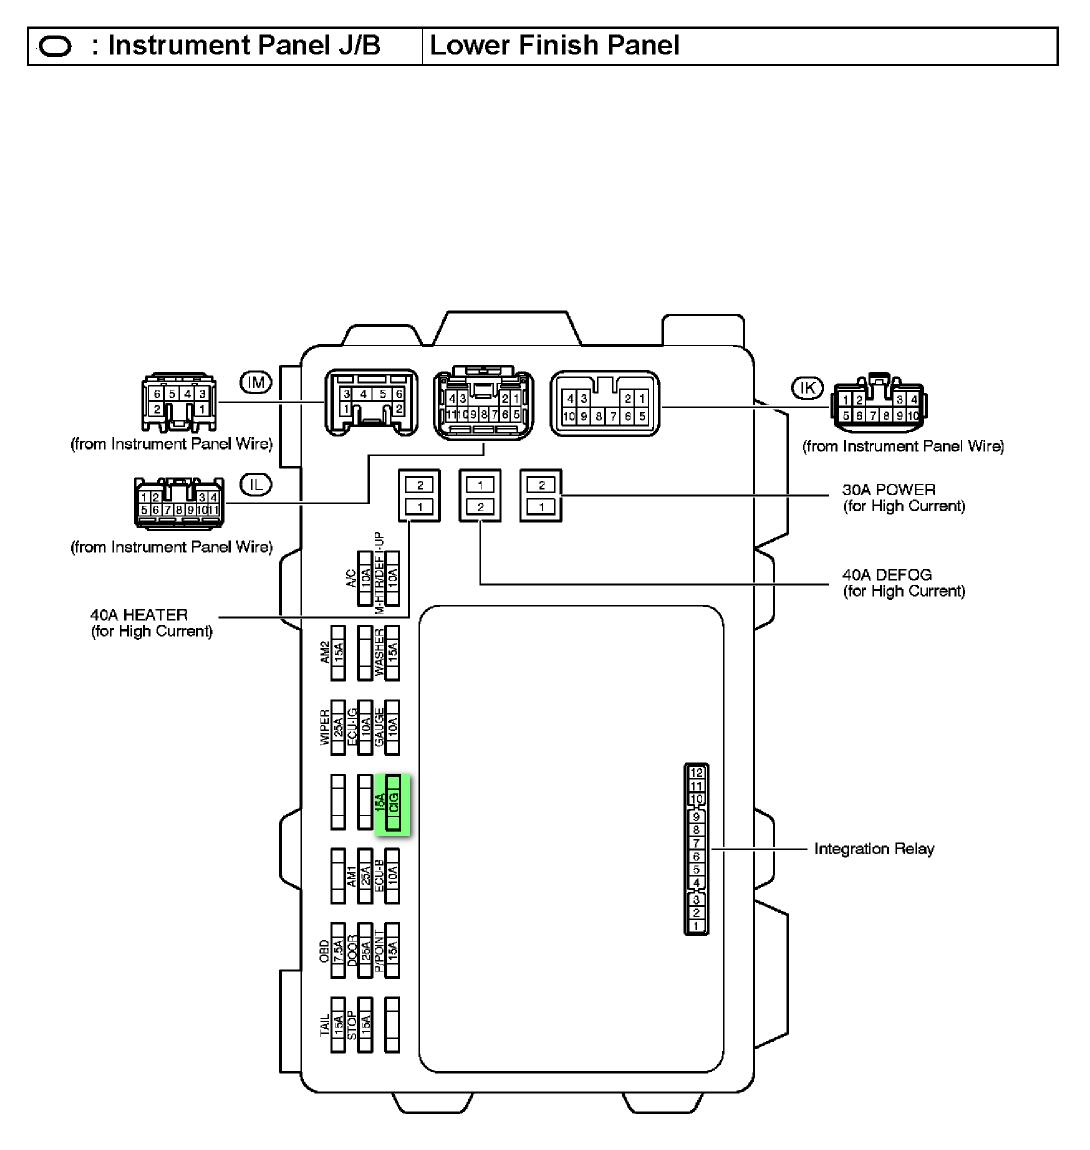 06 corolla fuse diagram - gm 6 0 engine diagram for wiring diagram  schematics  wiring diagram schematics